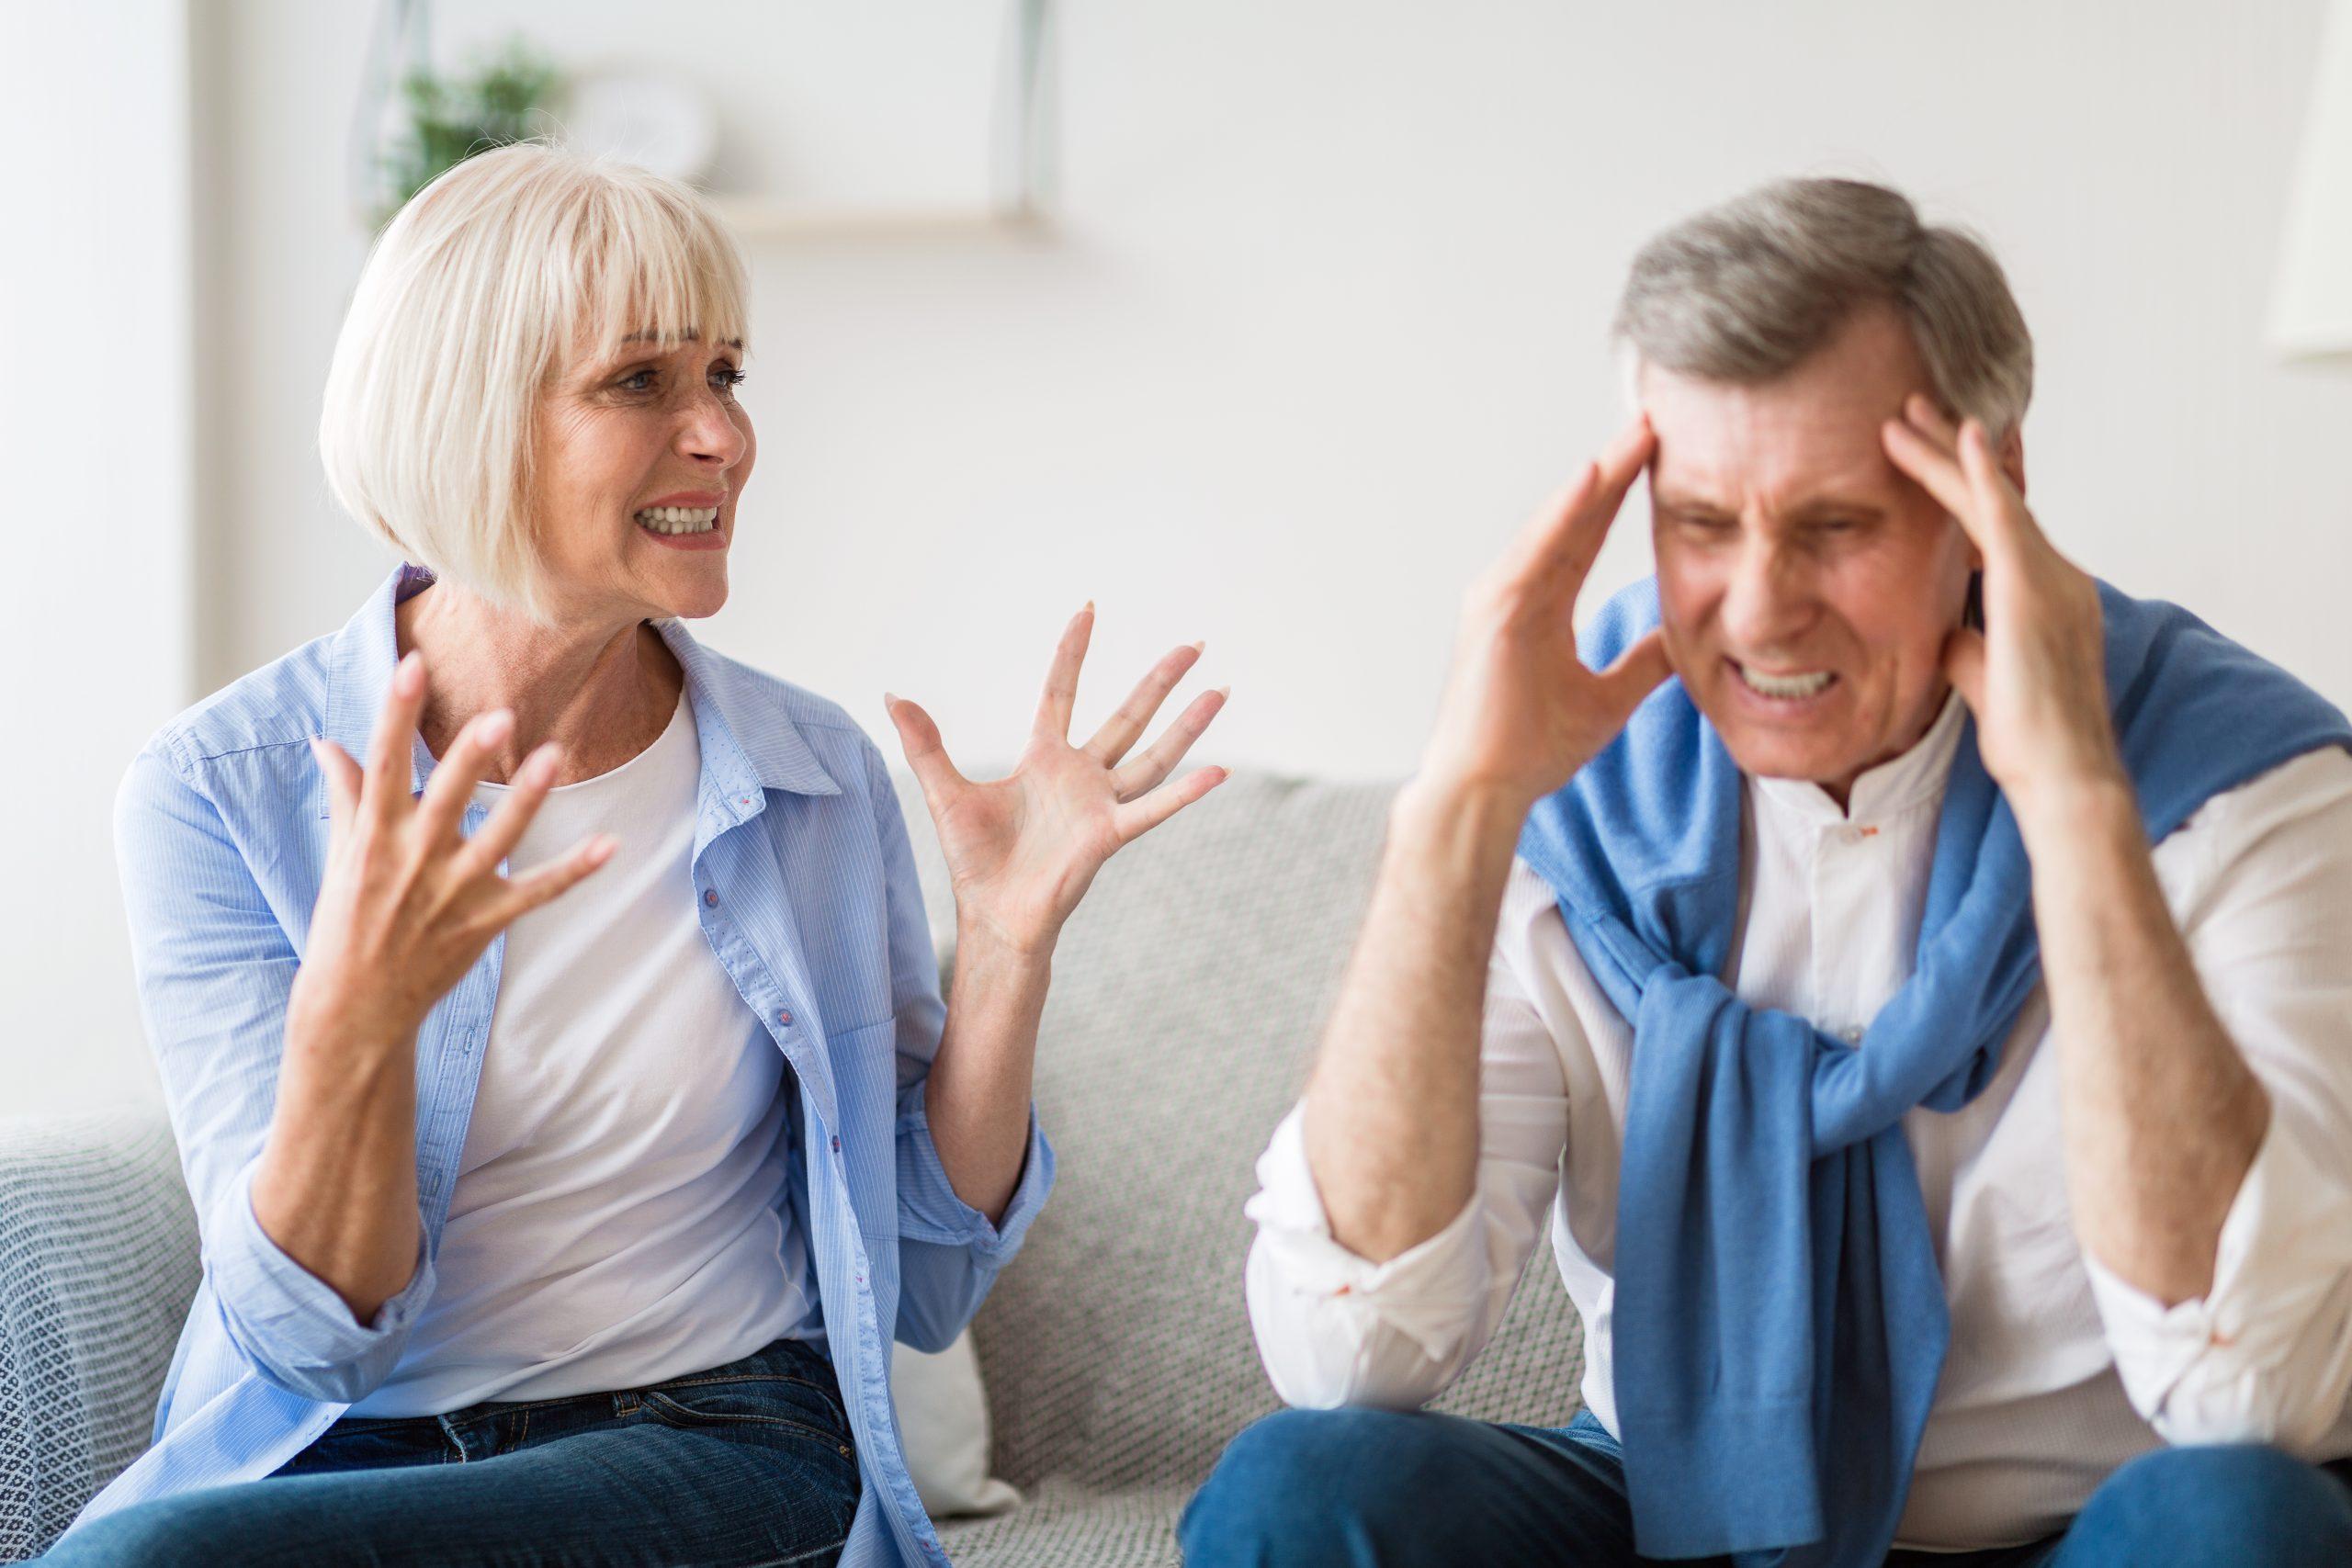 Elderly couple arguing about divorce after retirement